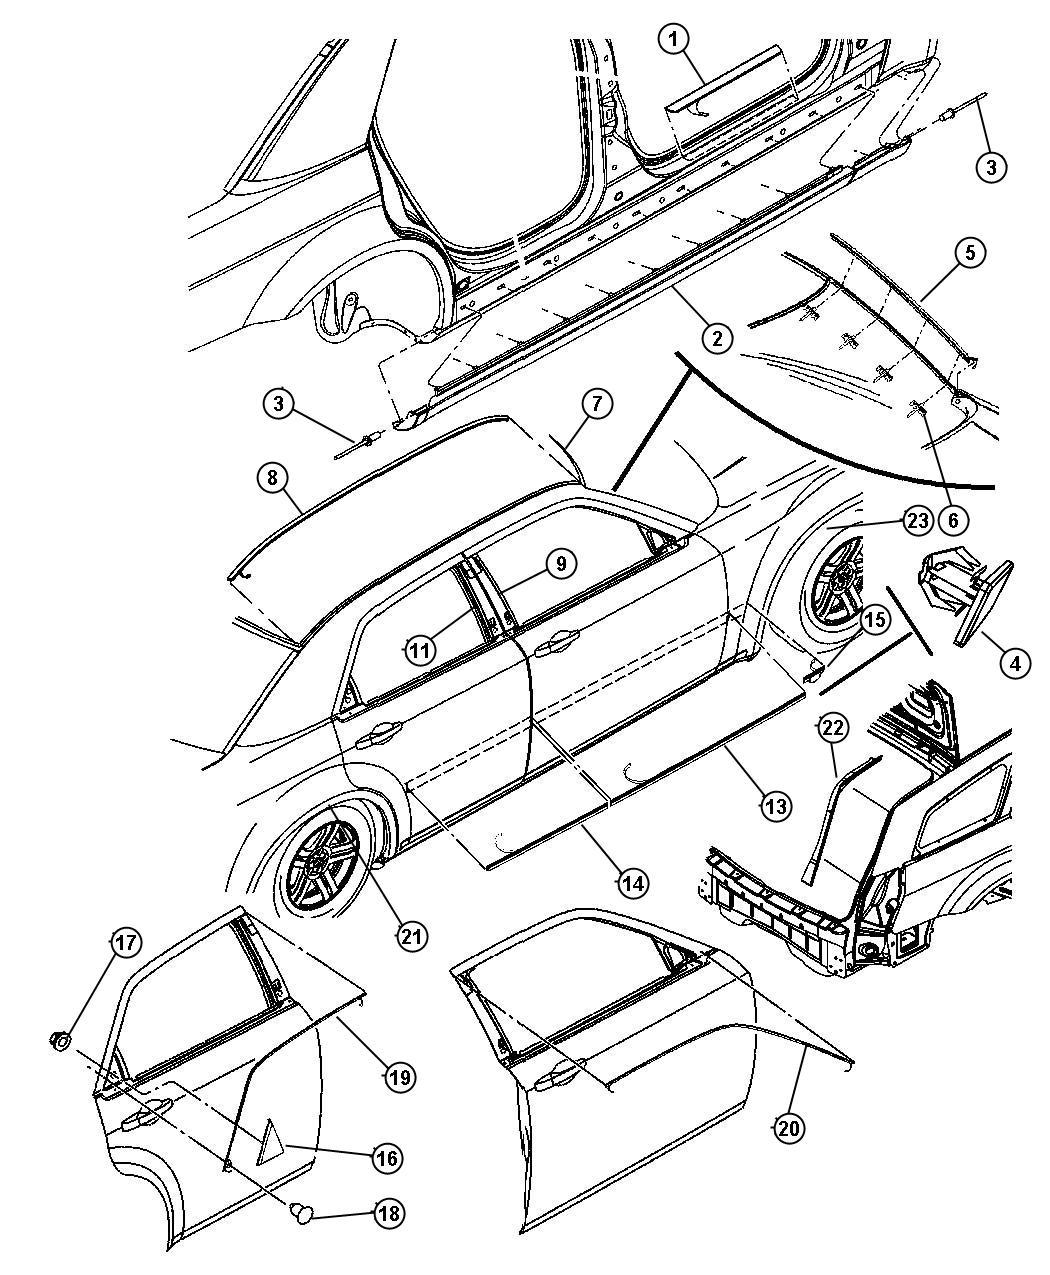 Wiring Diagram Dodge Magnum Srt8